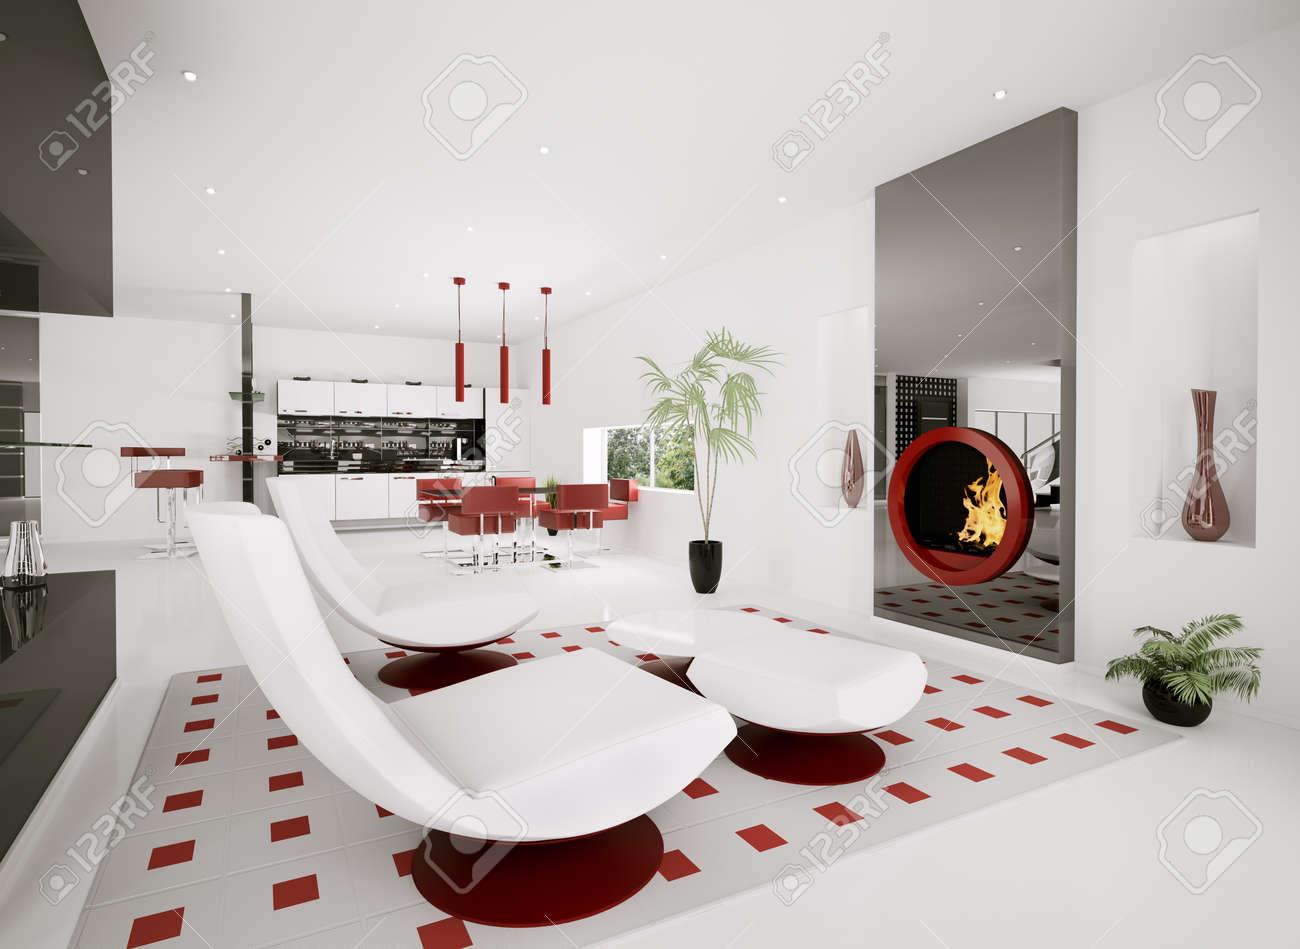 Interior of modern apartment living room kitchen 3d render Stock Photo - 8468850